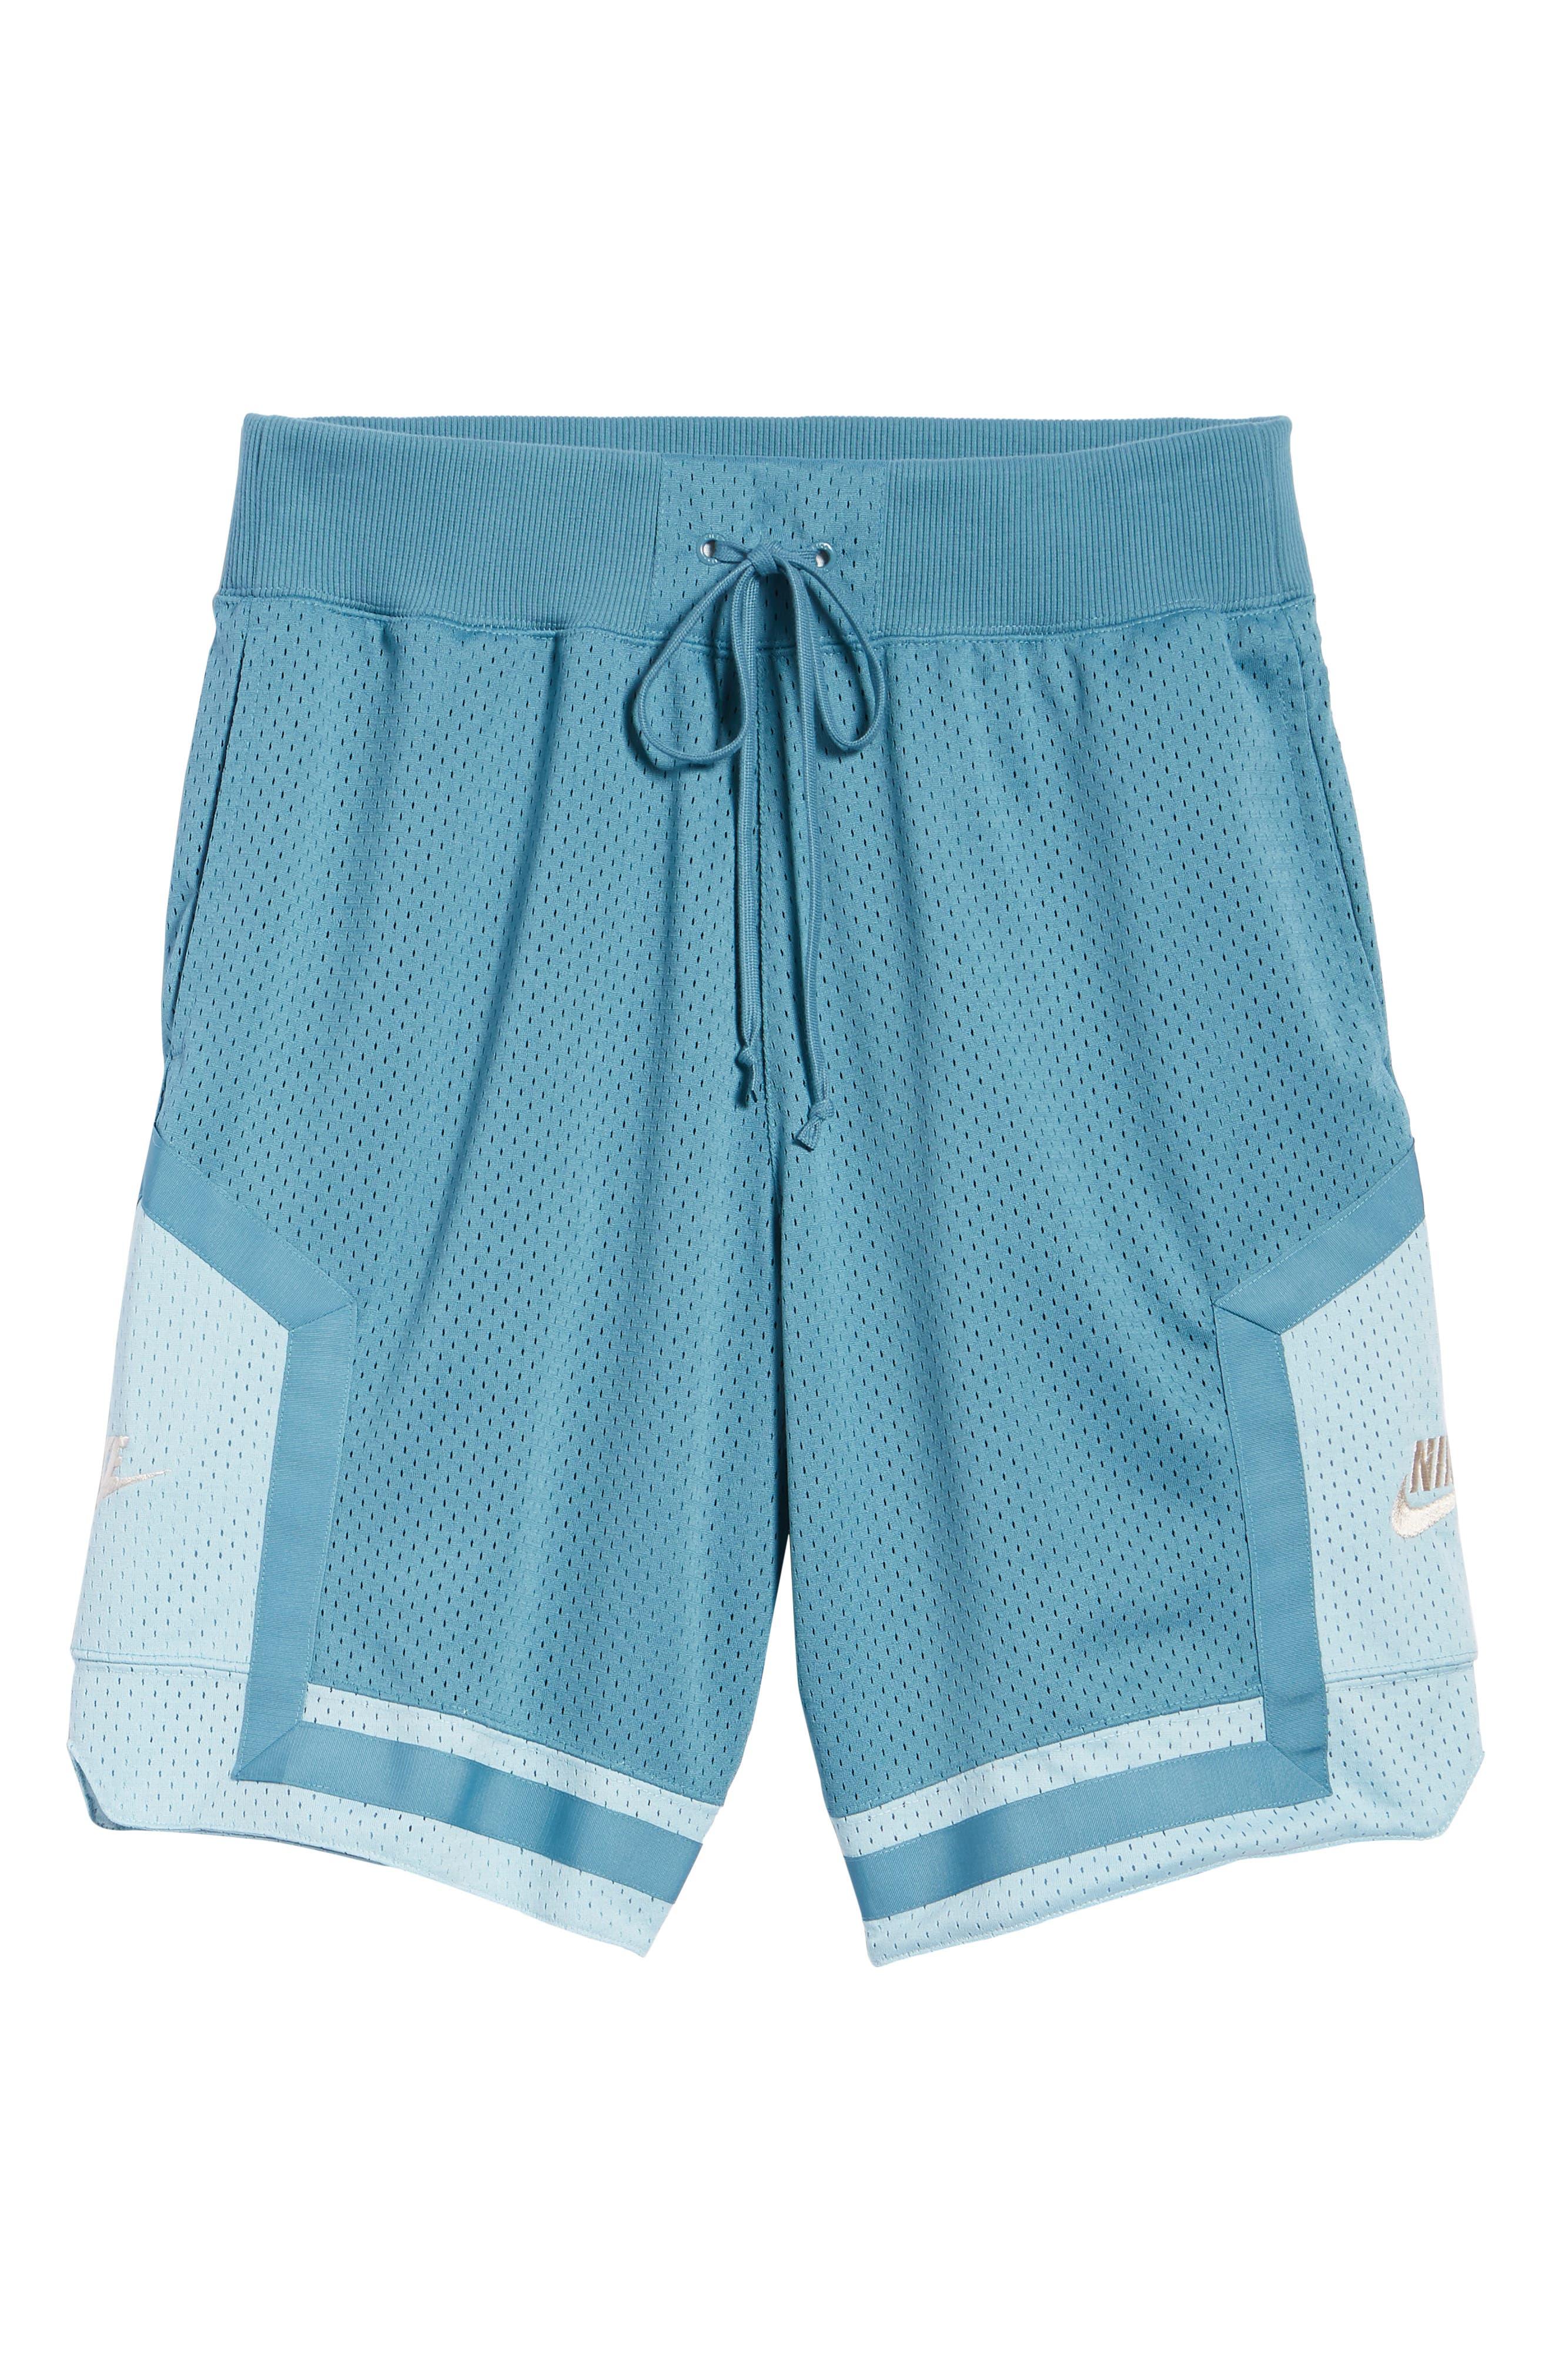 NSW AF1 Shorts,                             Alternate thumbnail 6, color,                             AQUA/ OCEAN BLISS/ OREWOOD